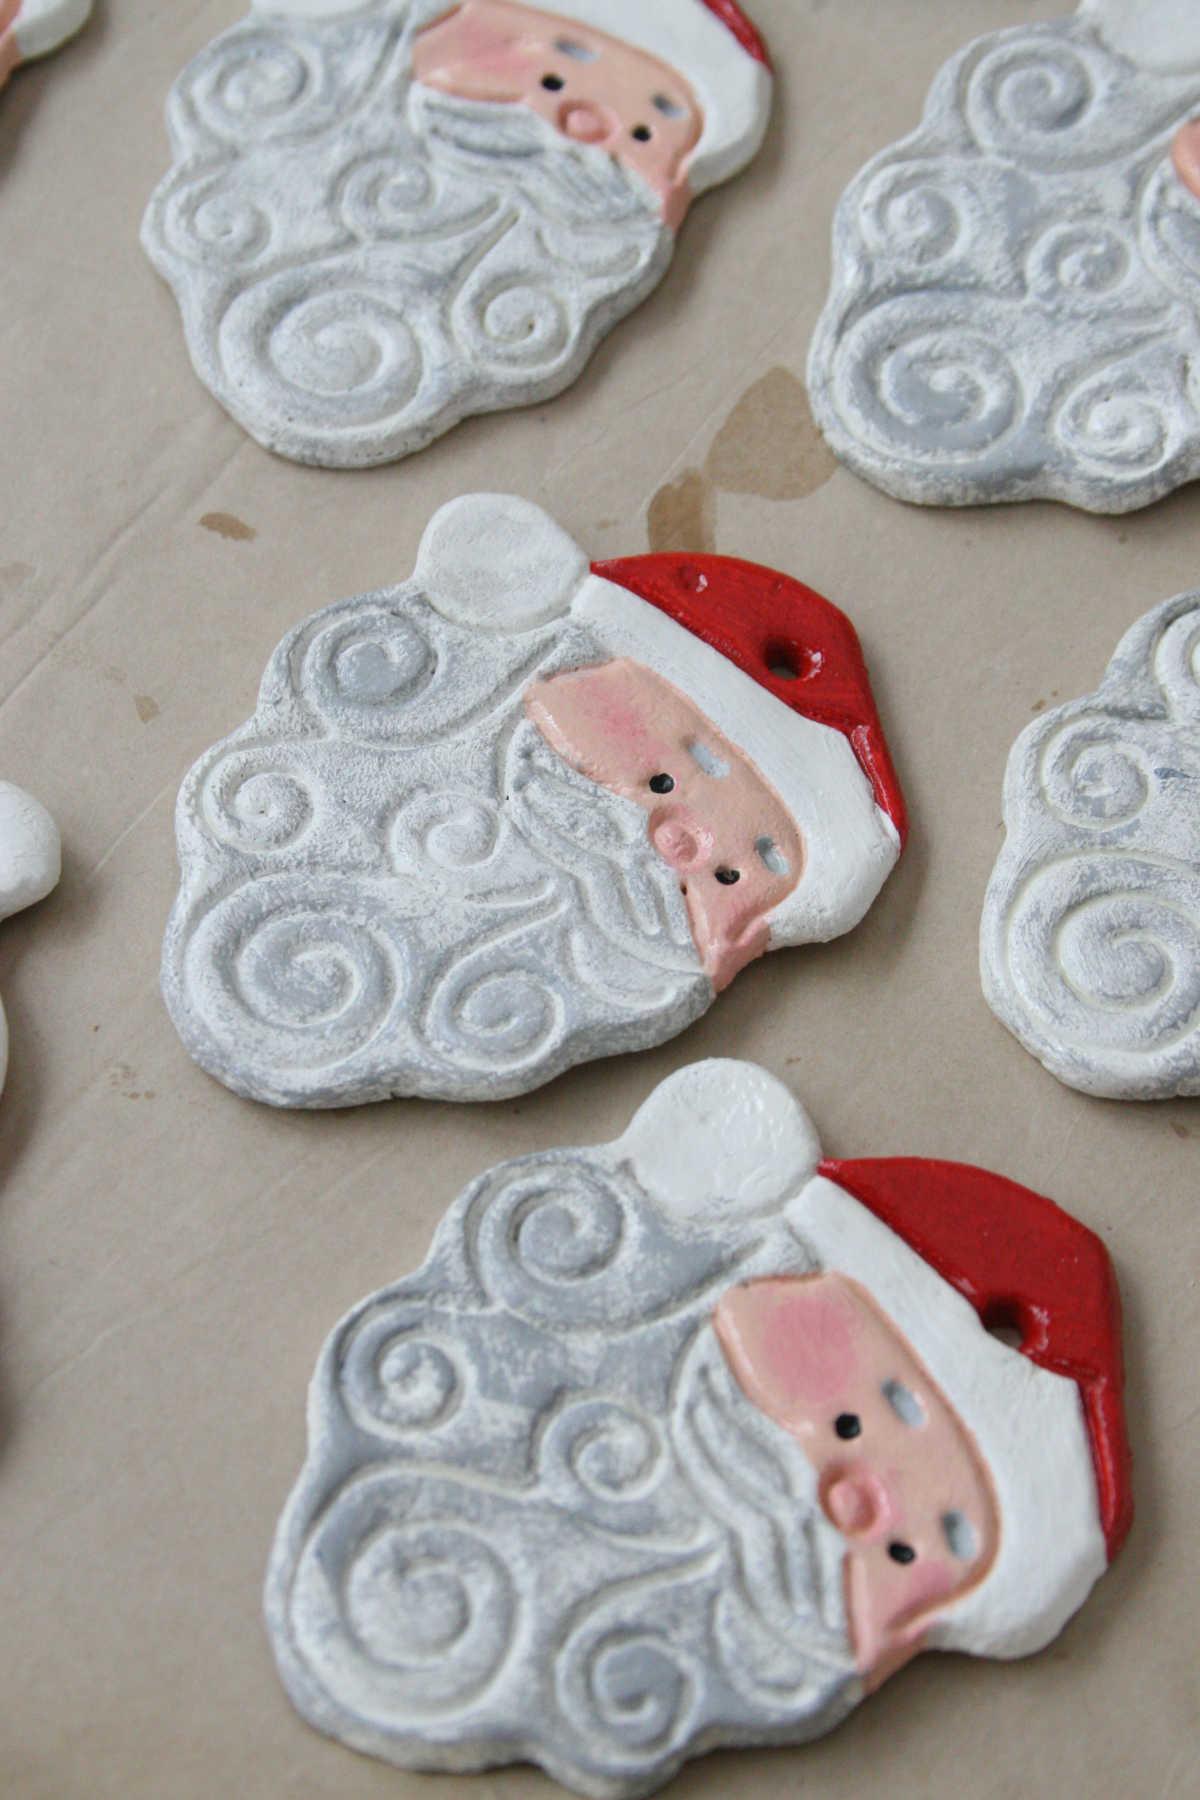 Salt dough ornaments of Santa faces drying on brown Kraft paper.